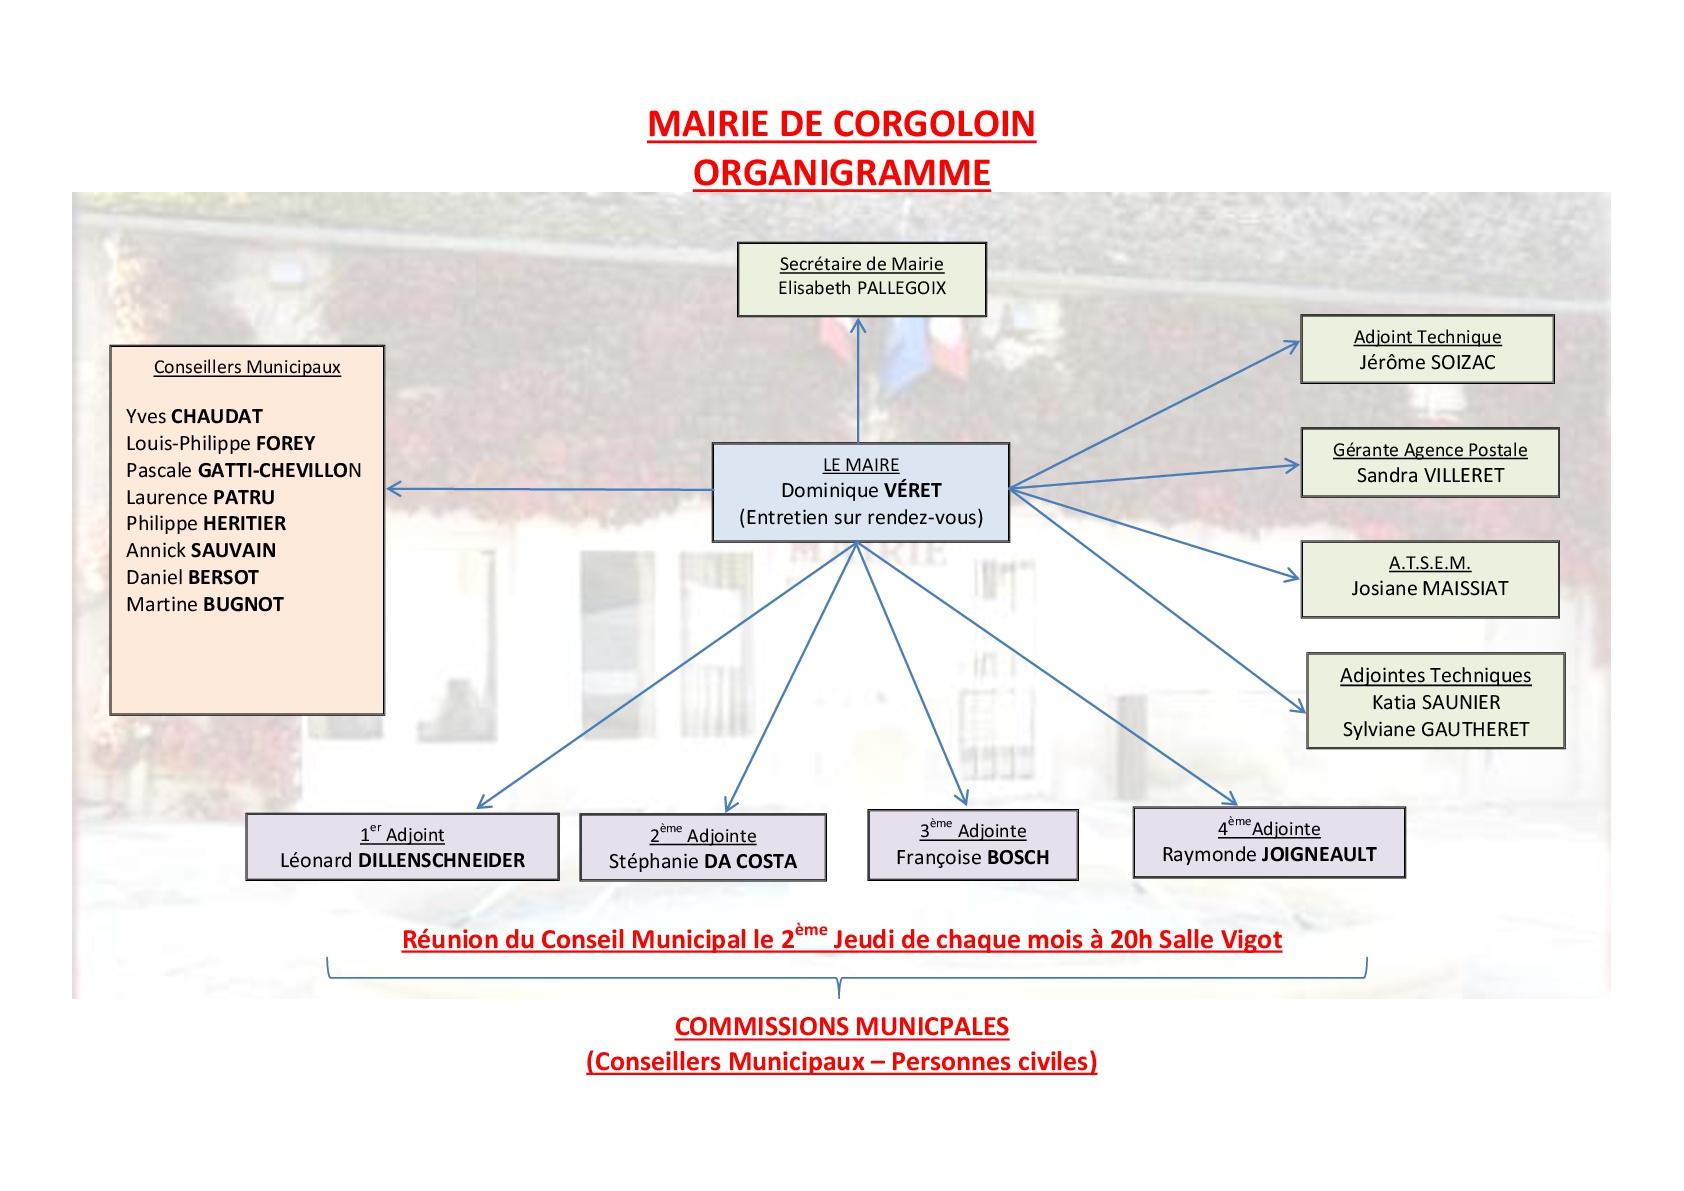 ORGANIGRAMME MAIRIE DE CORGOLOIN-001